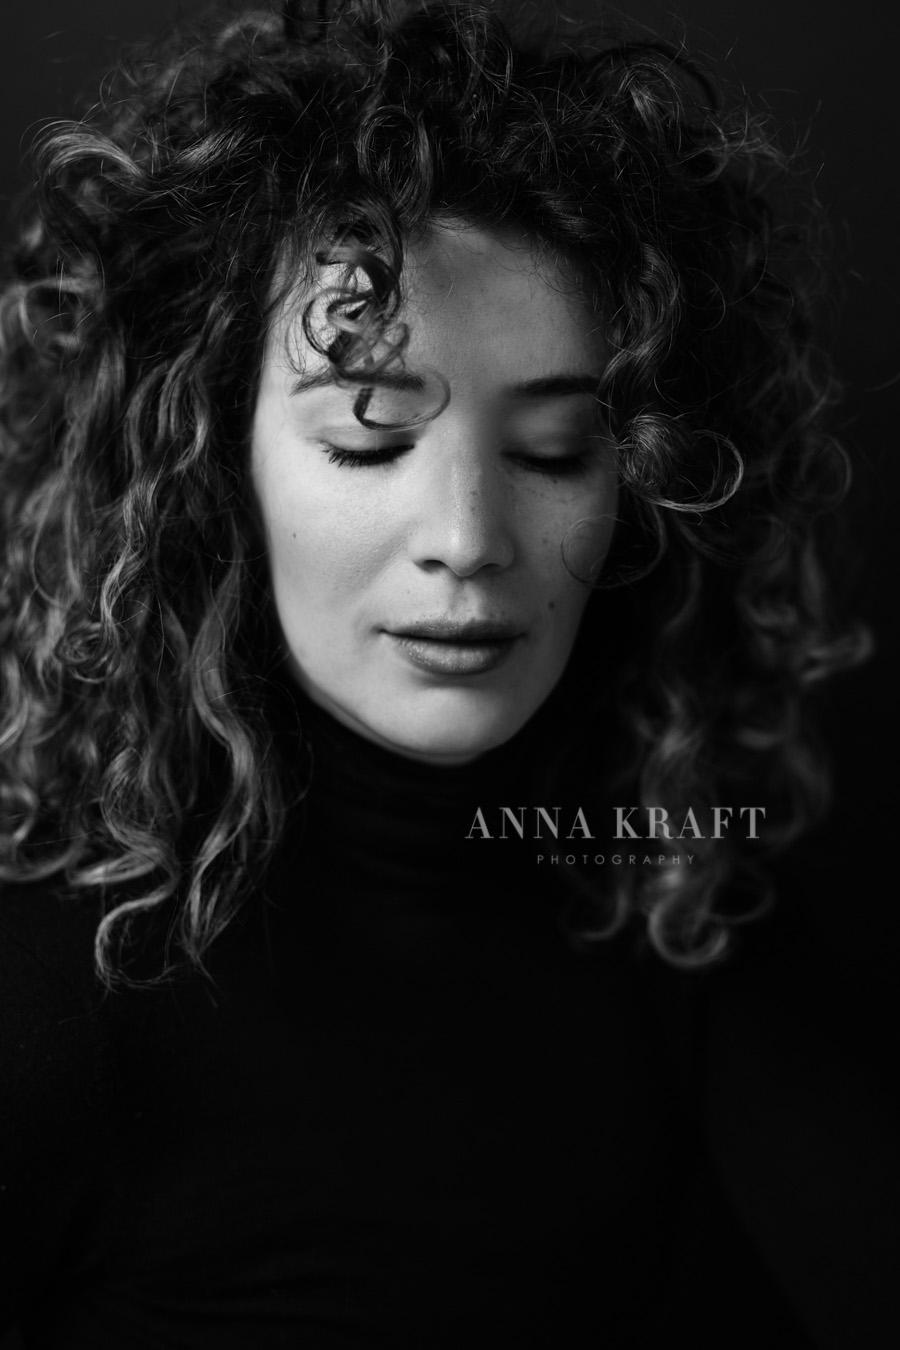 anna_kraft_photography_georgetown_square_studio_family_portrait-5.jpg